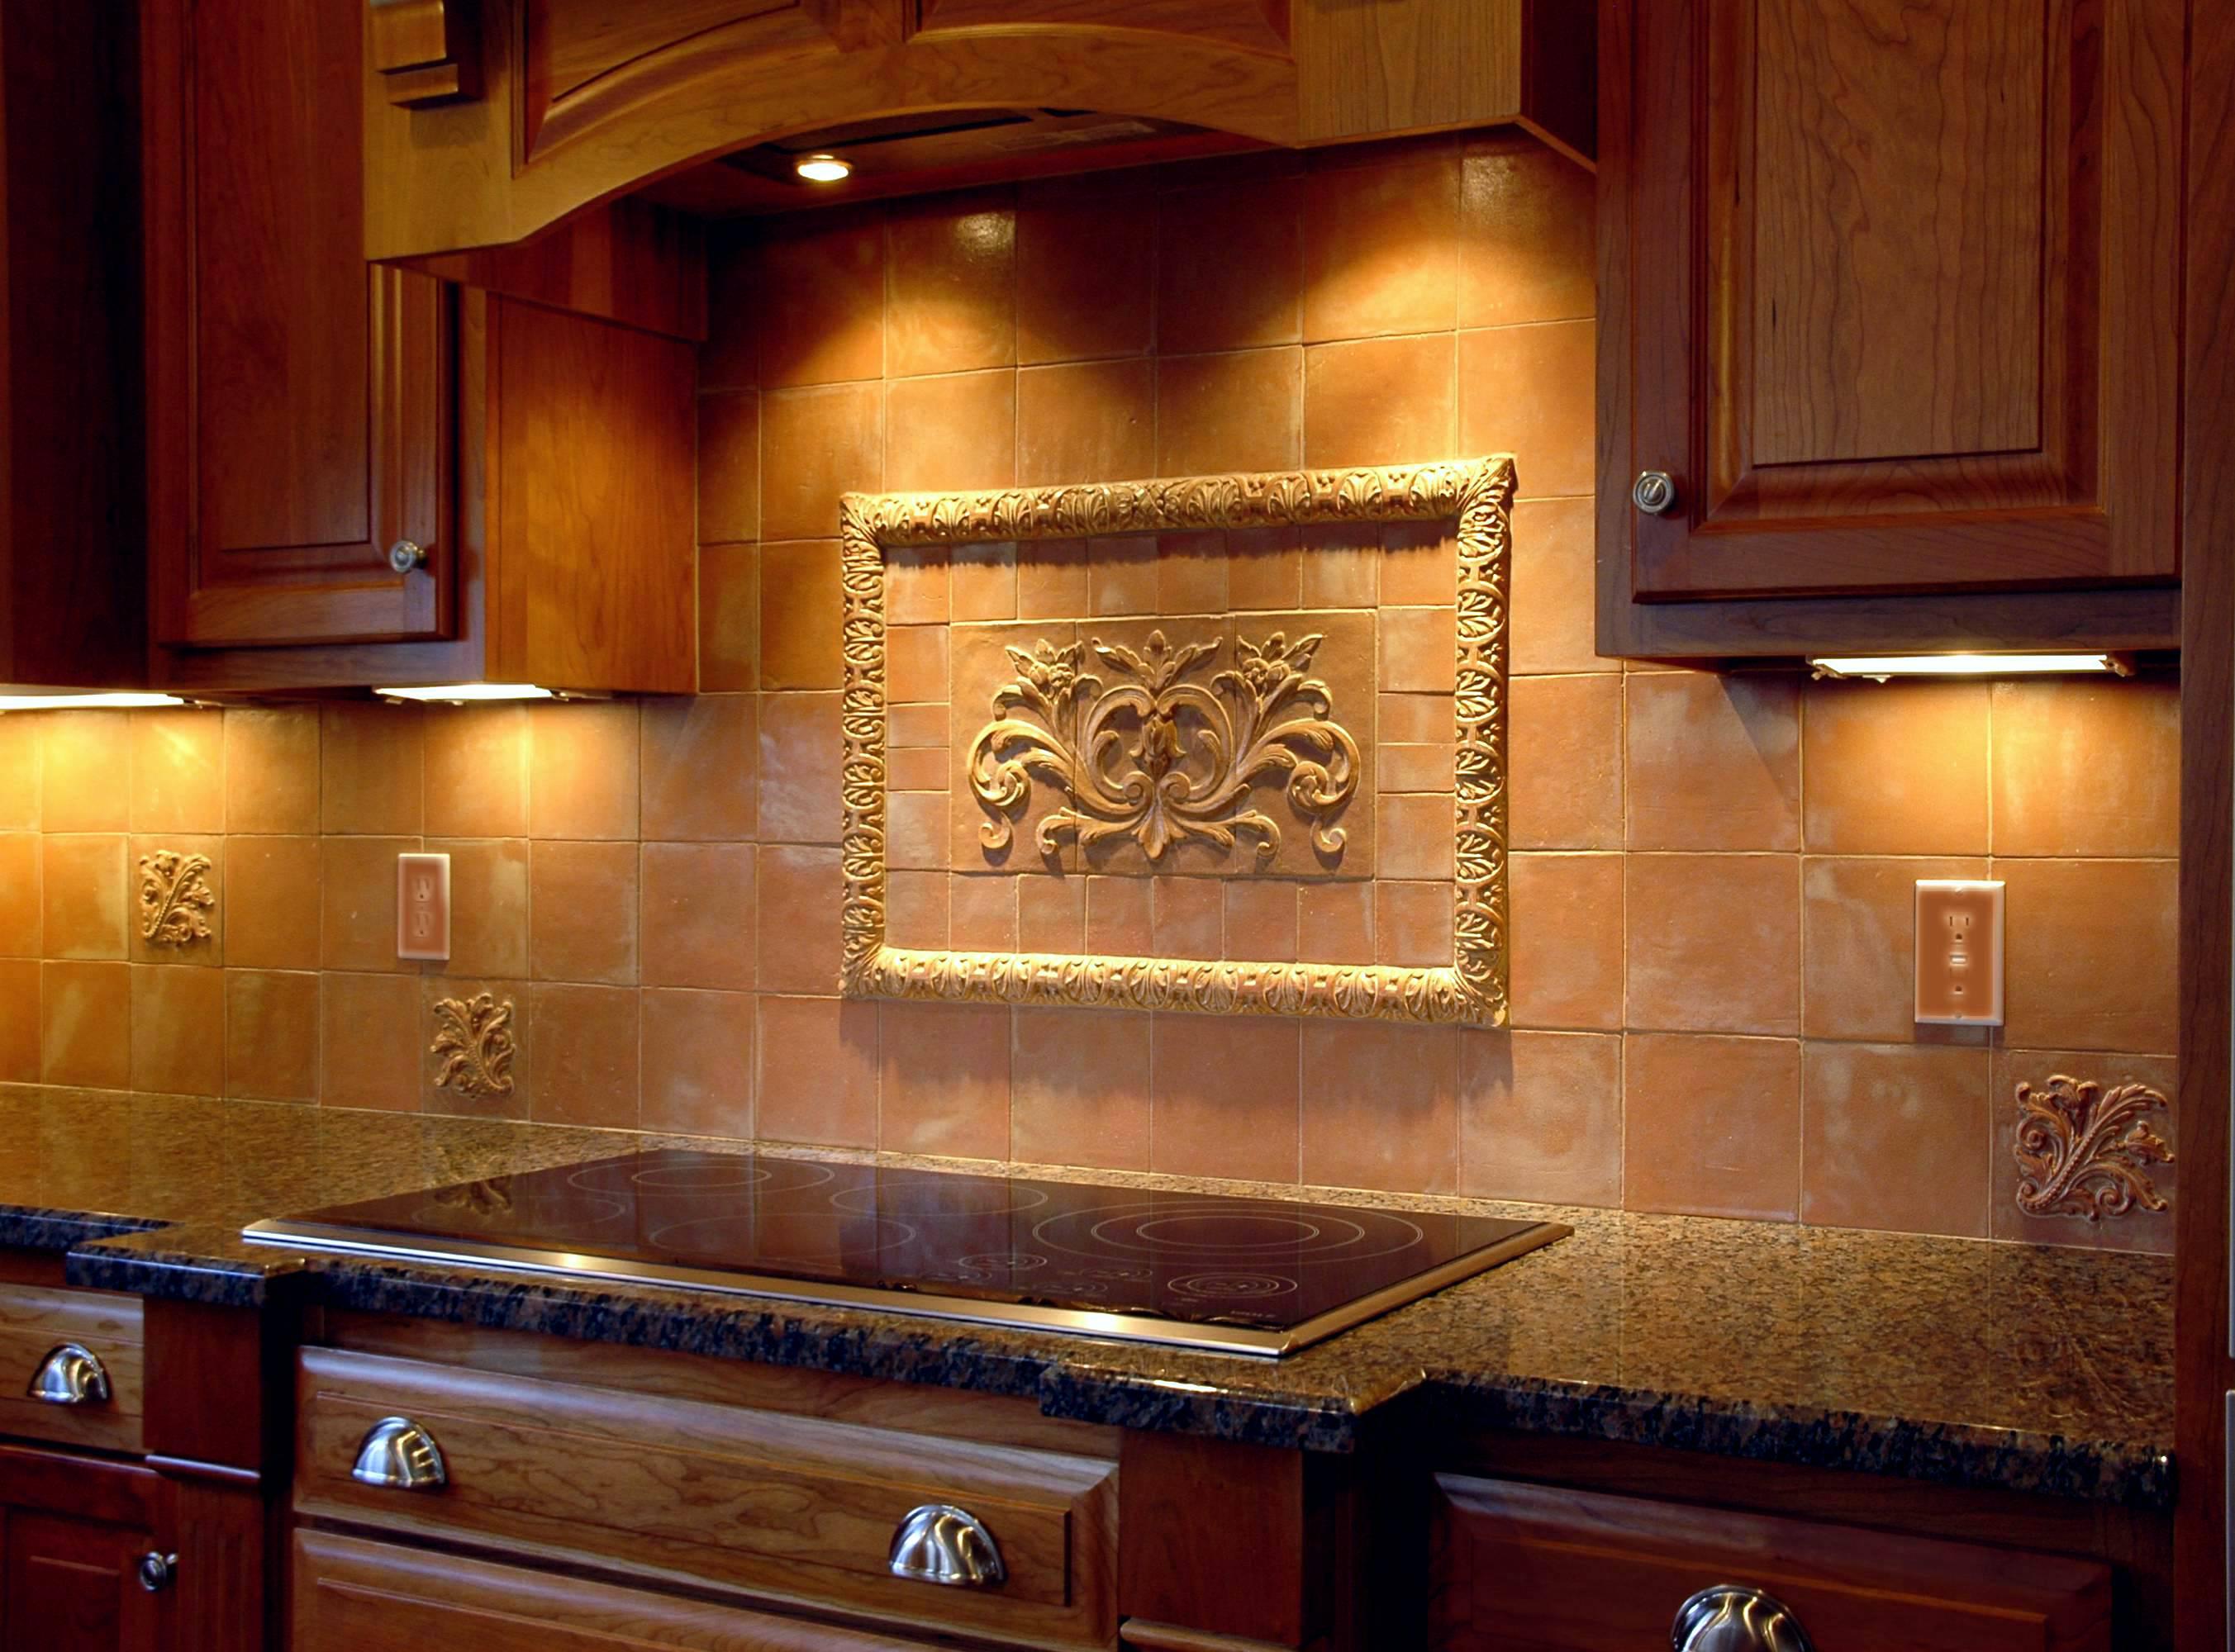 Hand pressed floral tiles installed in kitchen backsplash berg9 dailygadgetfo Images